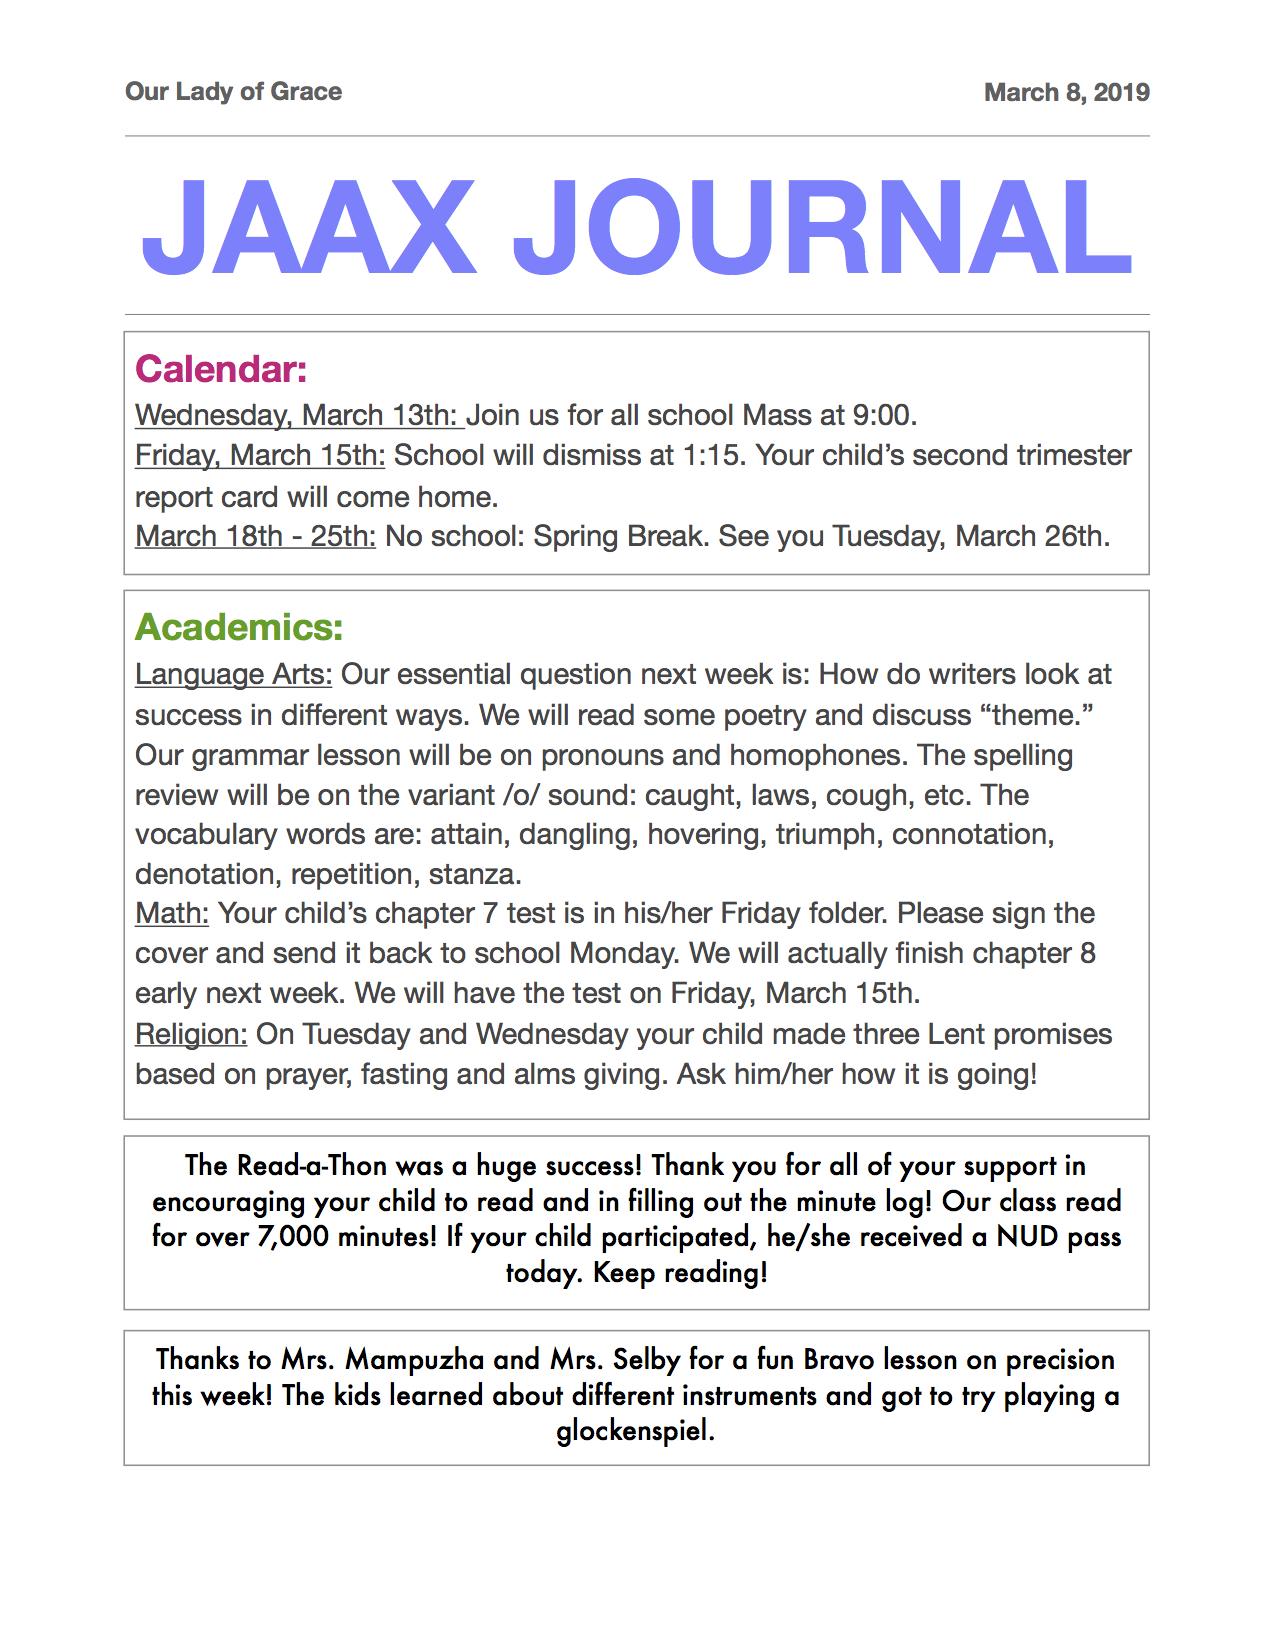 JaaxJournal3-8-19.jpg